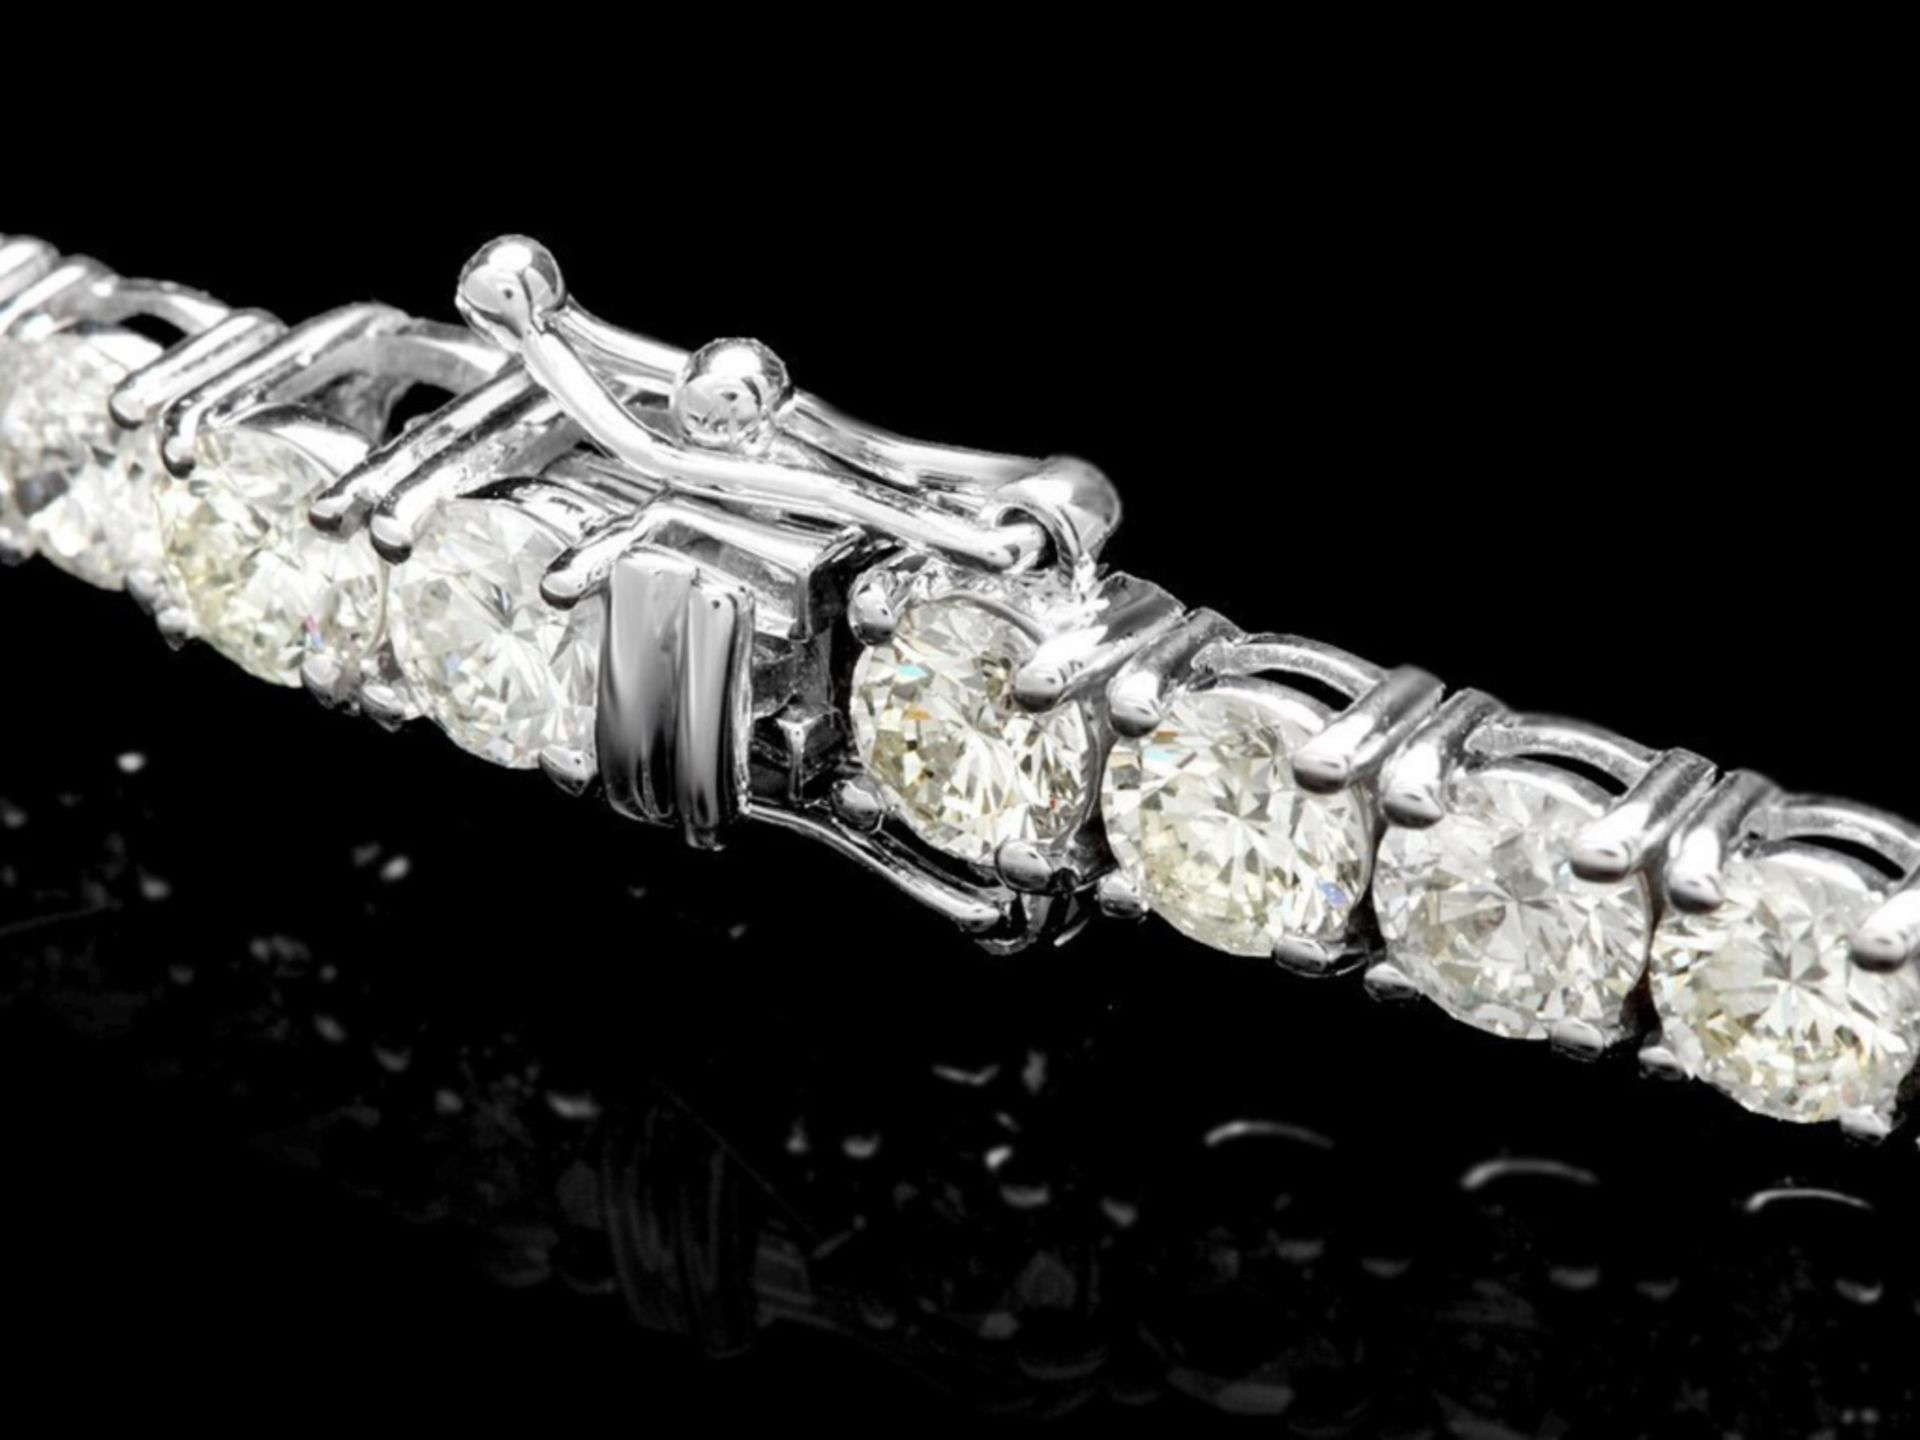 ^18k White Gold 12.00ct Diamond Tennis Bracelet - Image 2 of 4